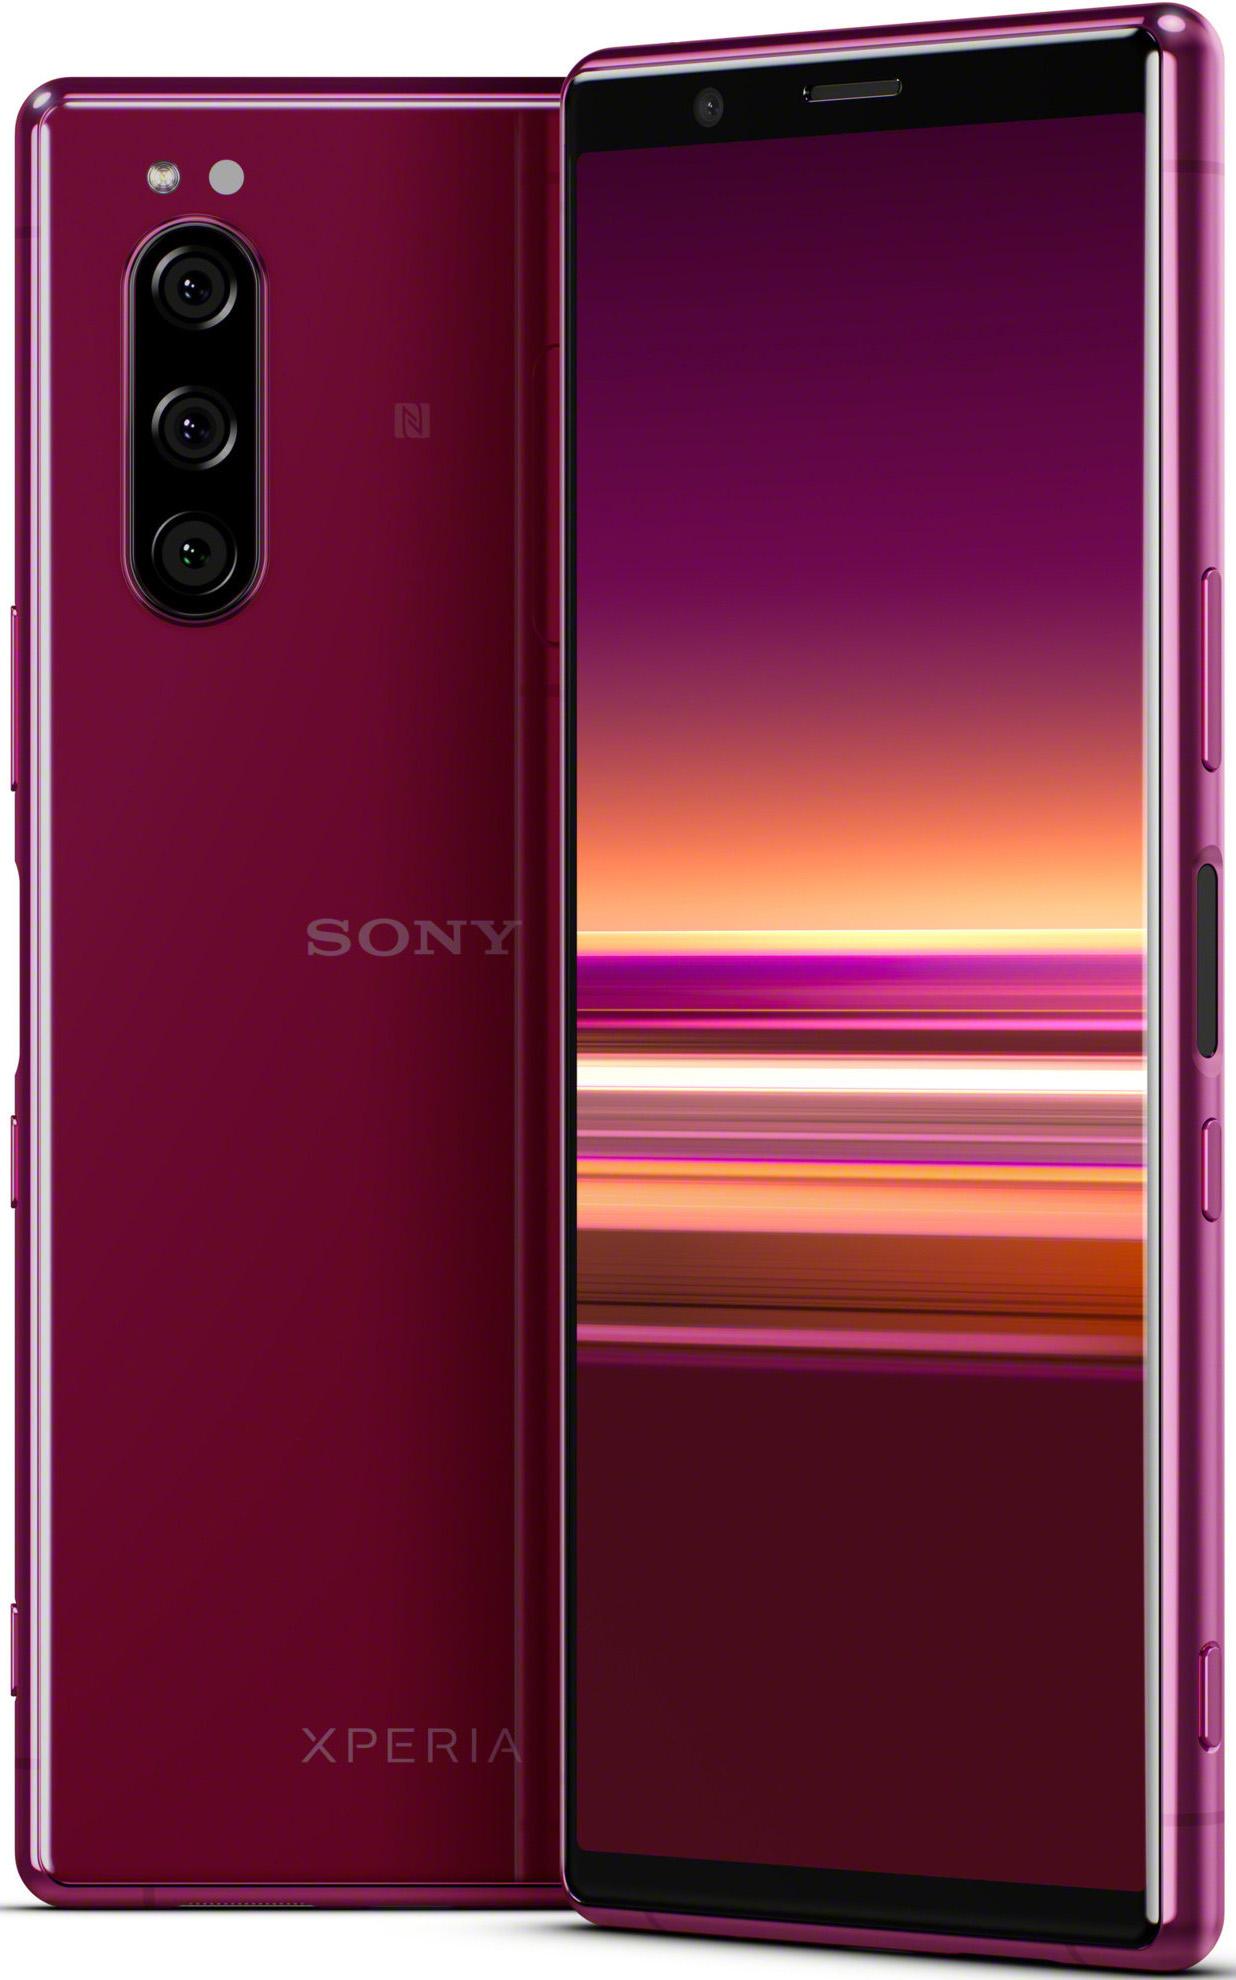 Sony Xperia 5 Dual SIM